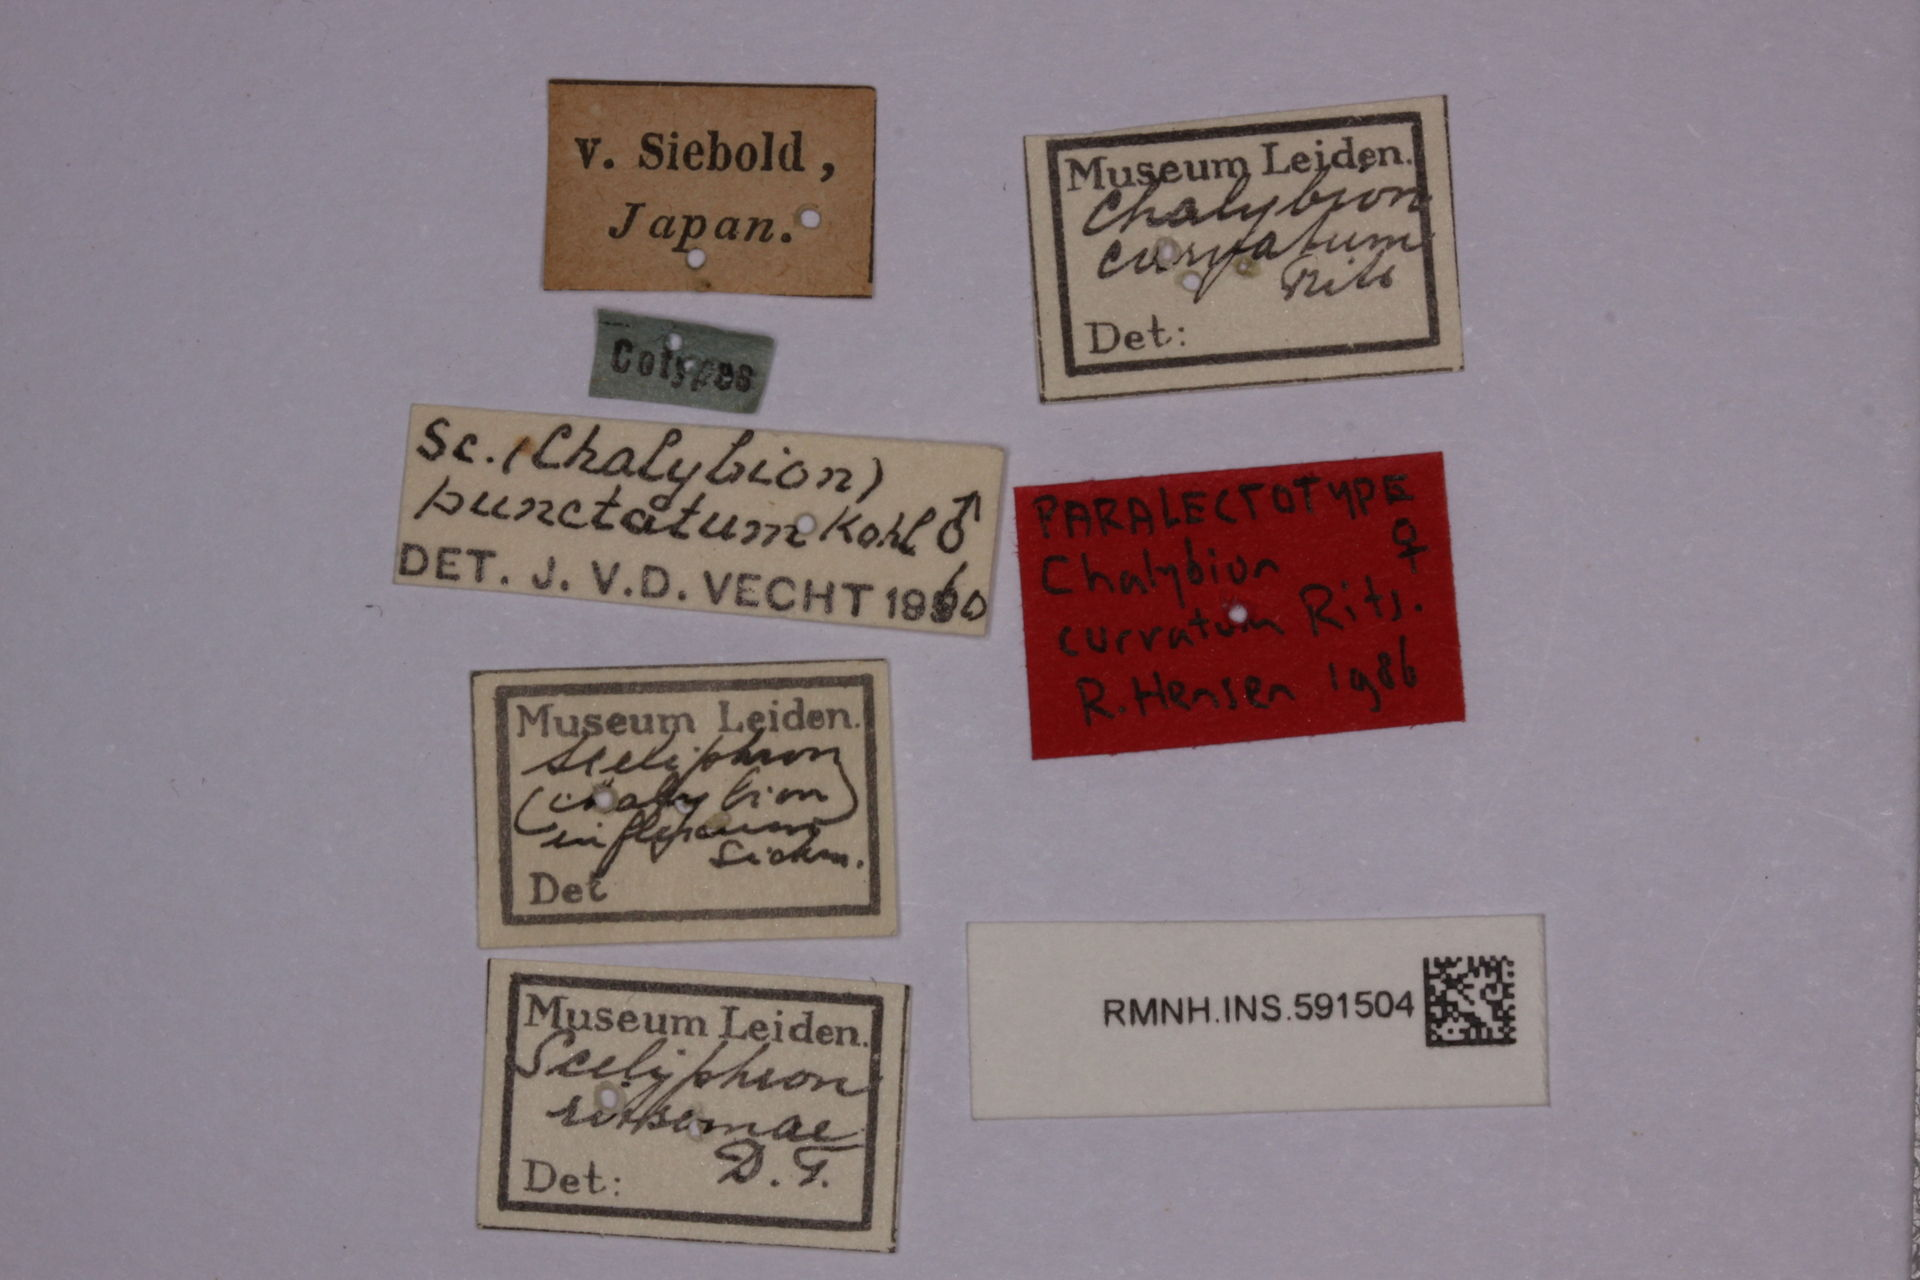 RMNH.INS.591504 | Chalybion japonicum (Gridobo, 1883)